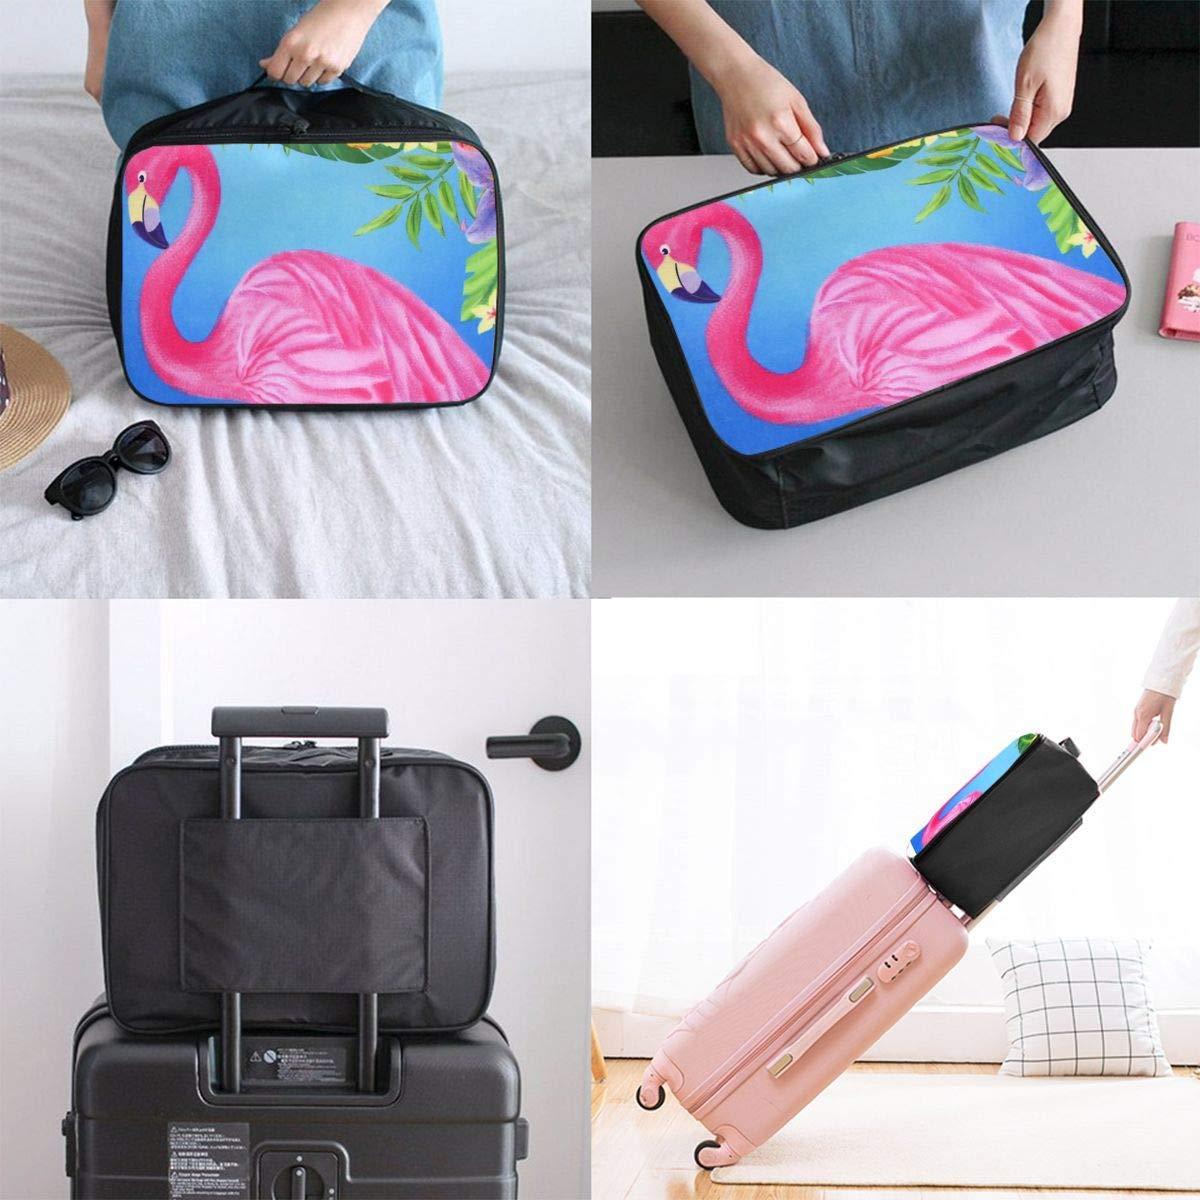 Lightweight Large Capacity Portable Duffel Bag for Men /& Women Spring Flamingo Art Travel Duffel Bag Backpack JTRVW Luggage Bags for Travel